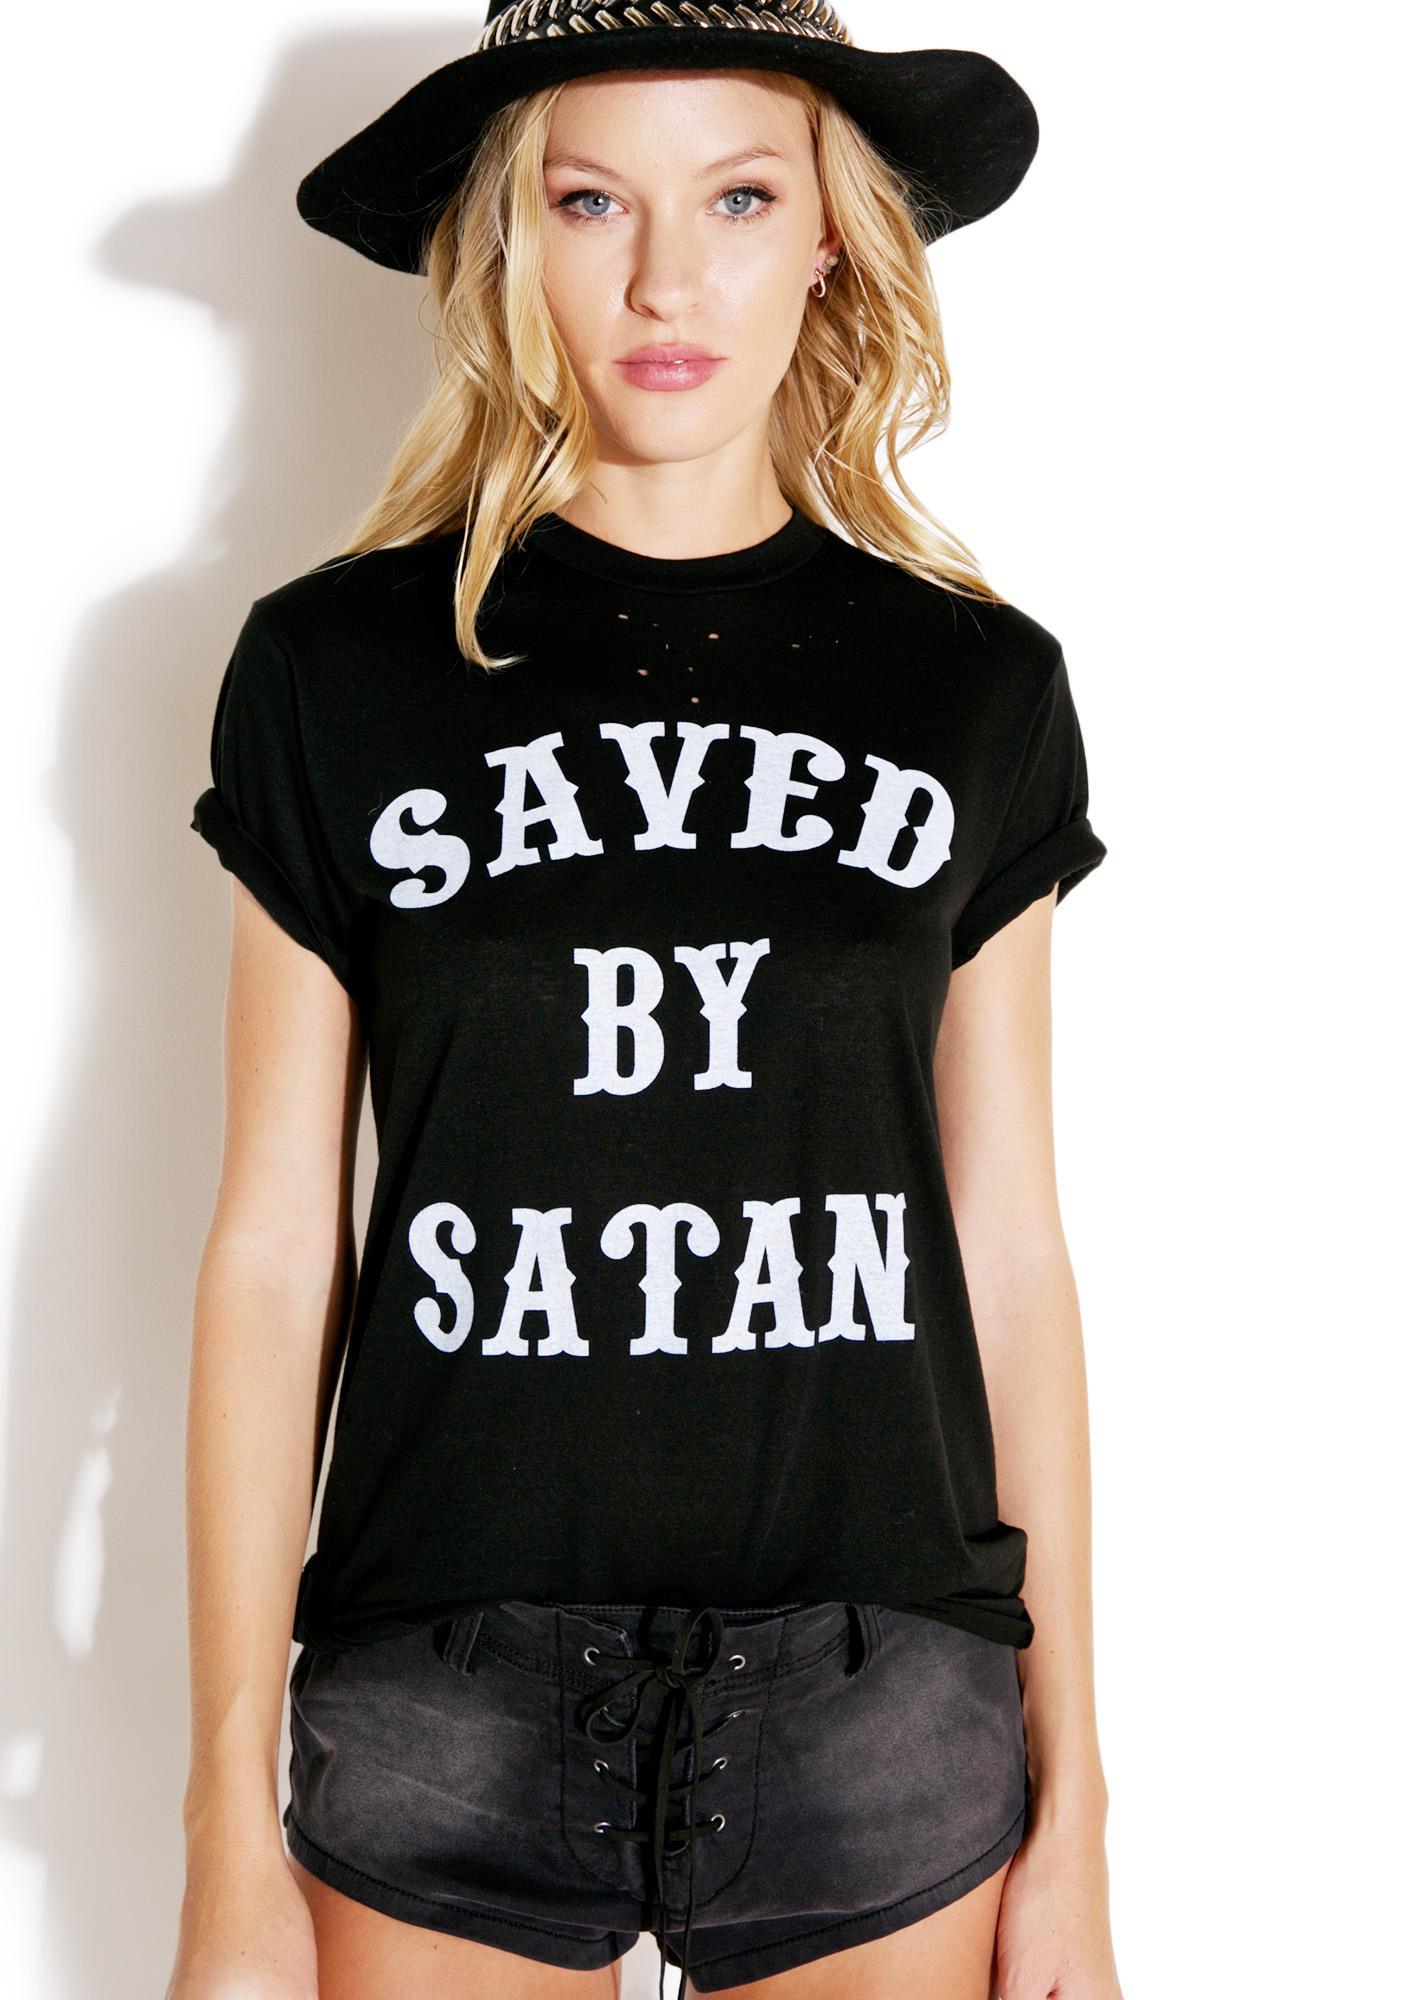 Local Boogeyman Saved By Satan Tee